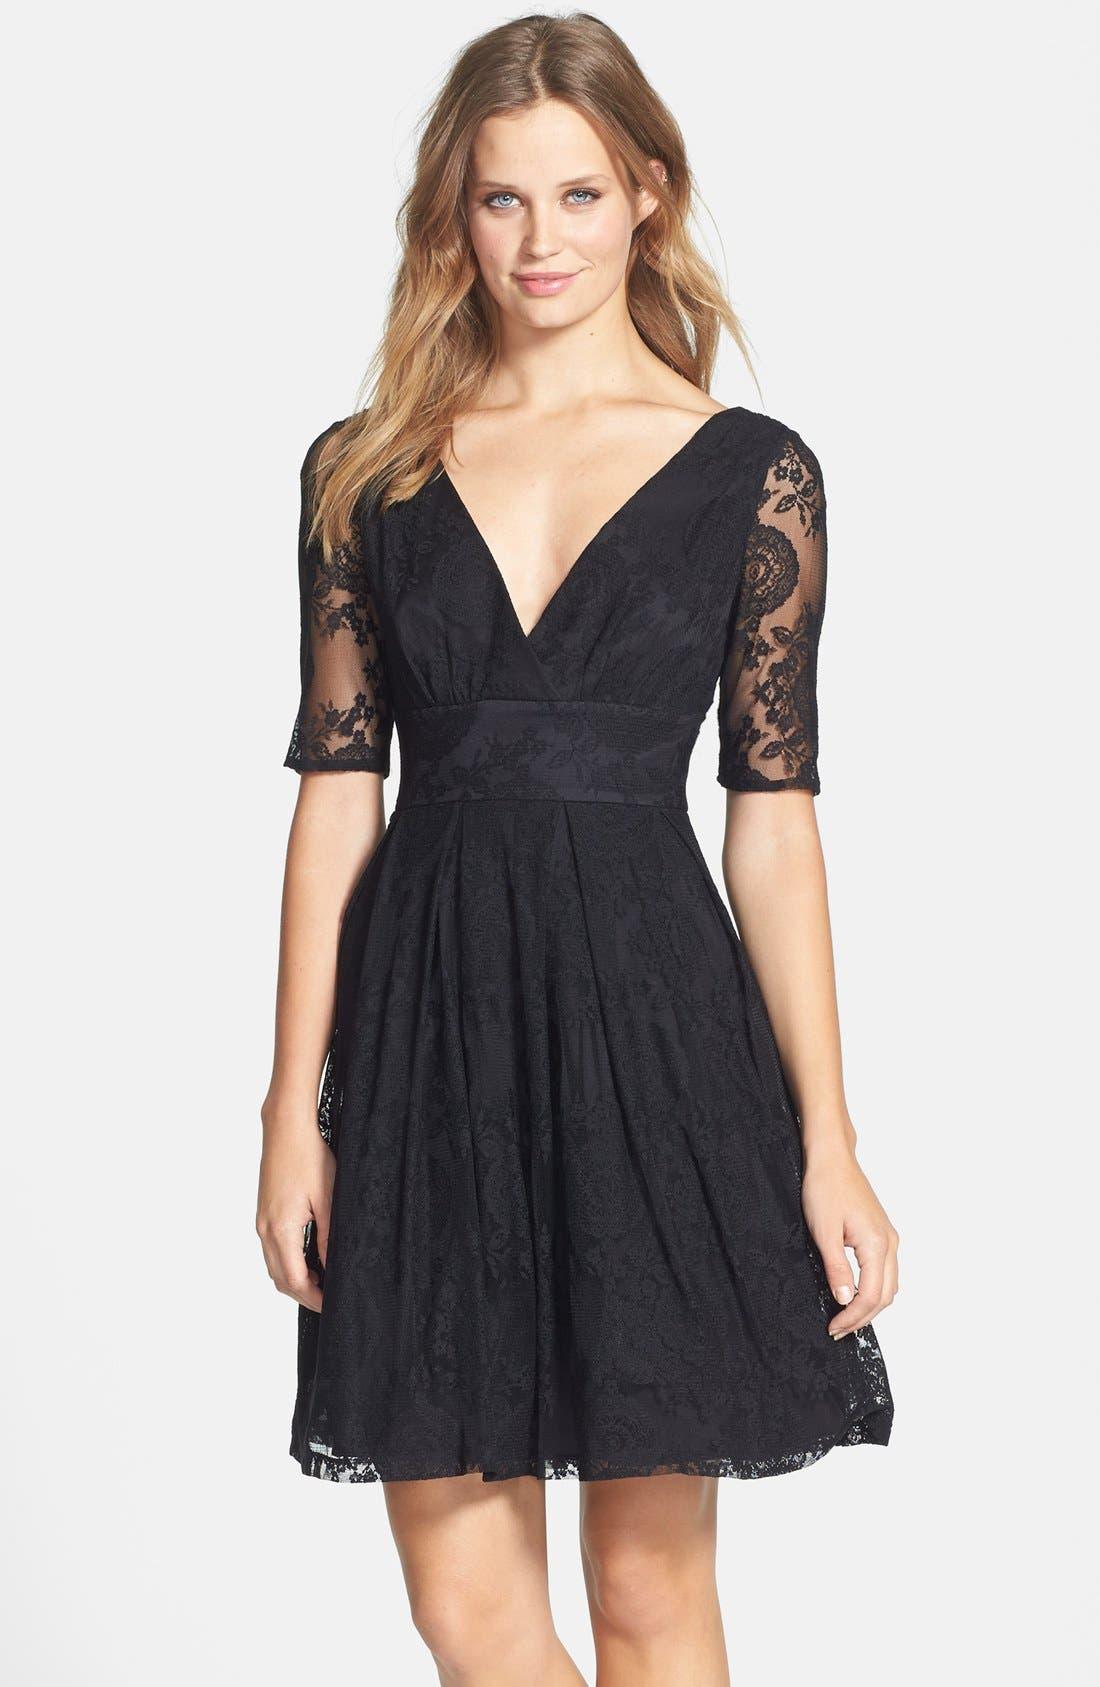 Alternate Image 1 Selected - Betsey Johnson V-Neck Lace Fit & Flare Dress